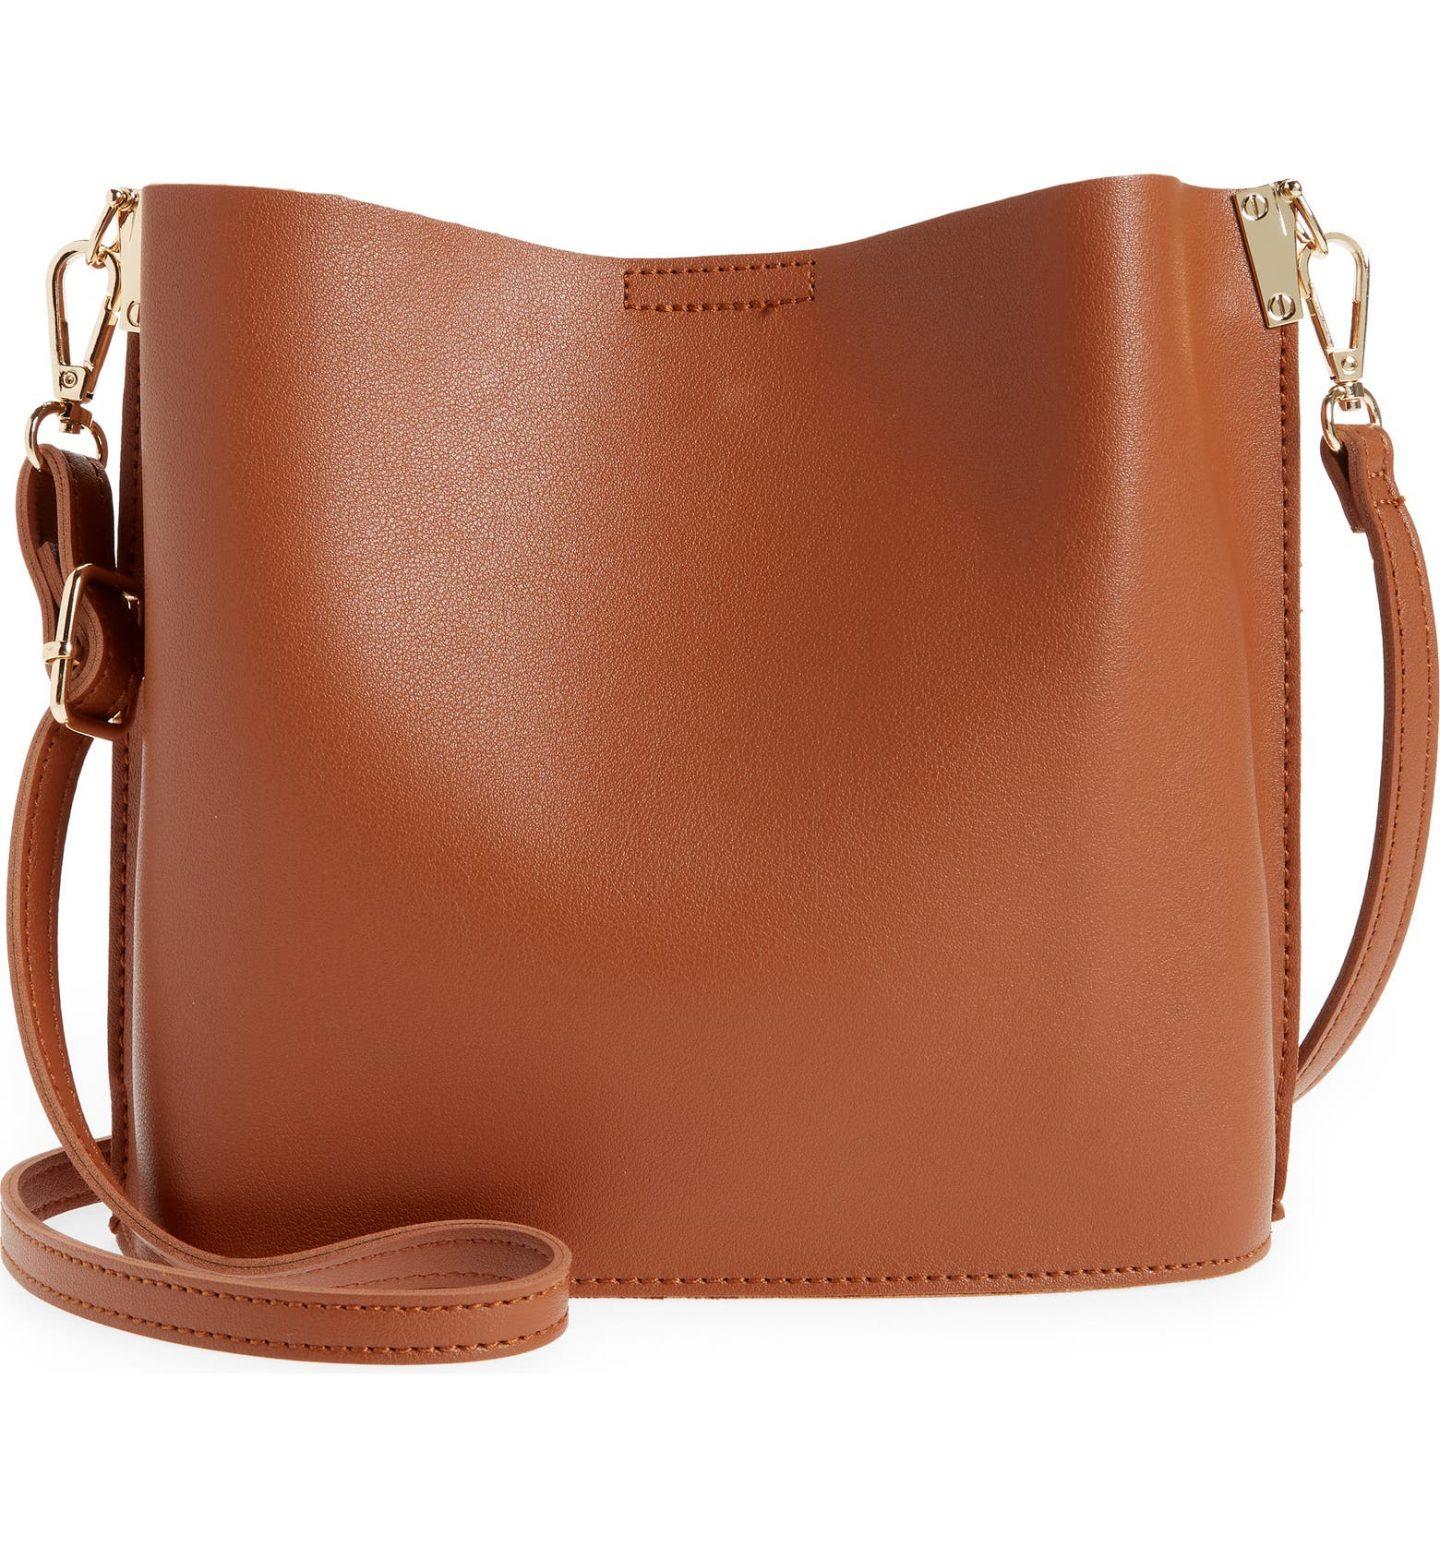 Tan camel minimalist crossbody purse